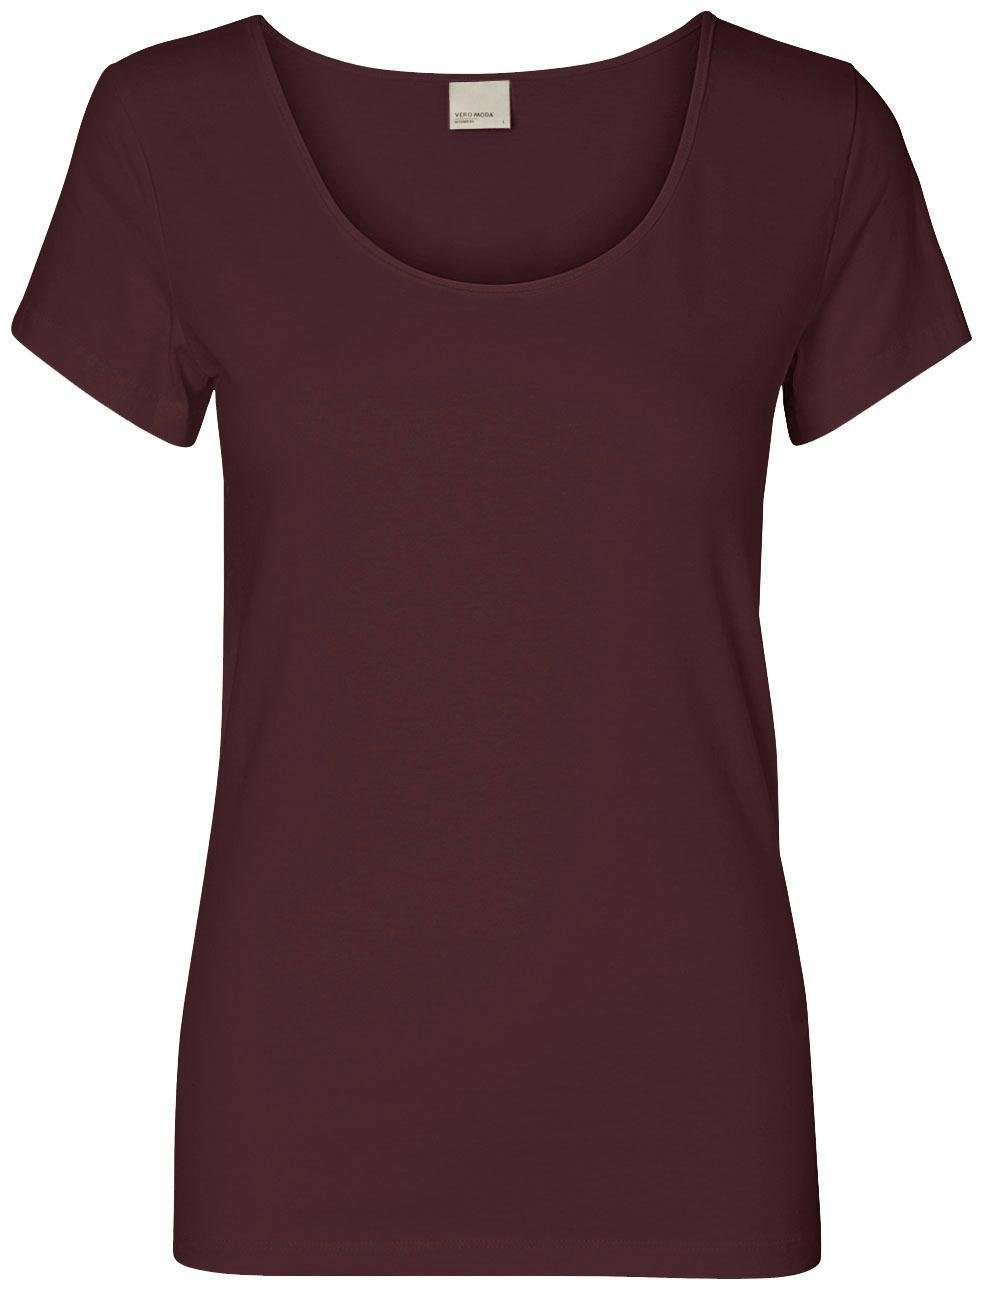 Vero Moda Rundhalsshirt MAXI   Bekleidung > Shirts > Rundhalsshirts   Vero Moda